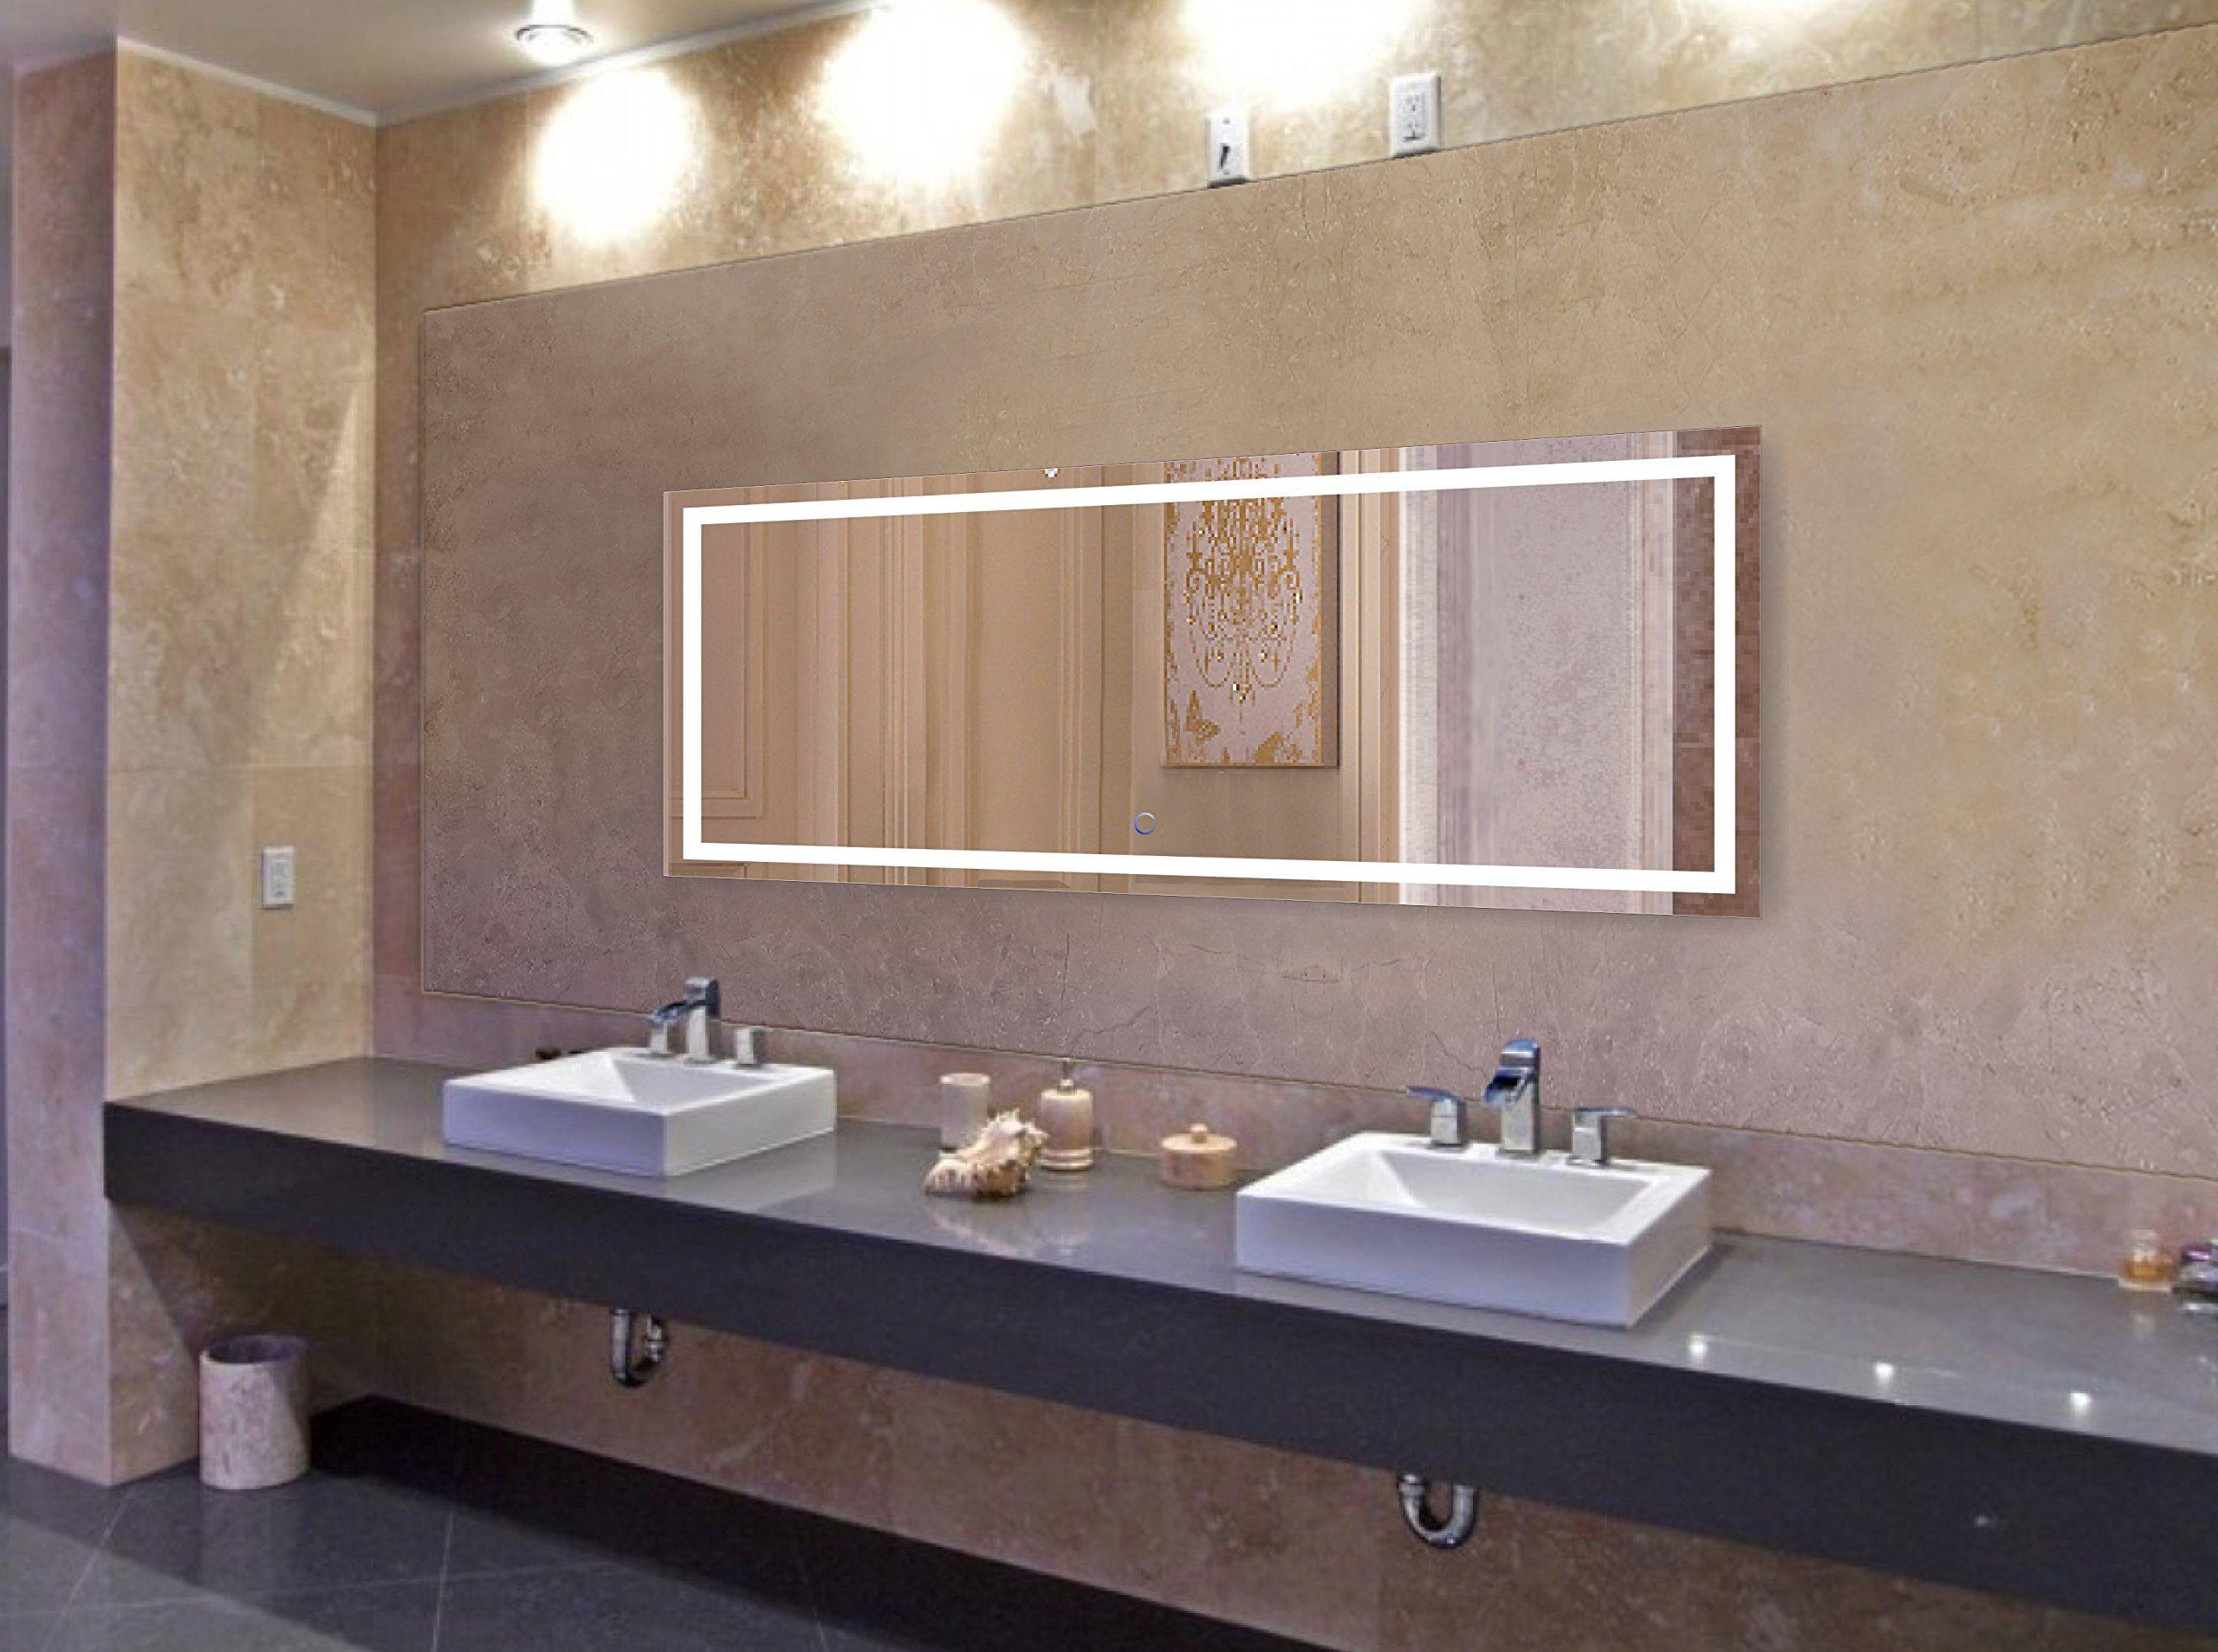 Krugg large inch x inch led bathroom mirror lighted vanity